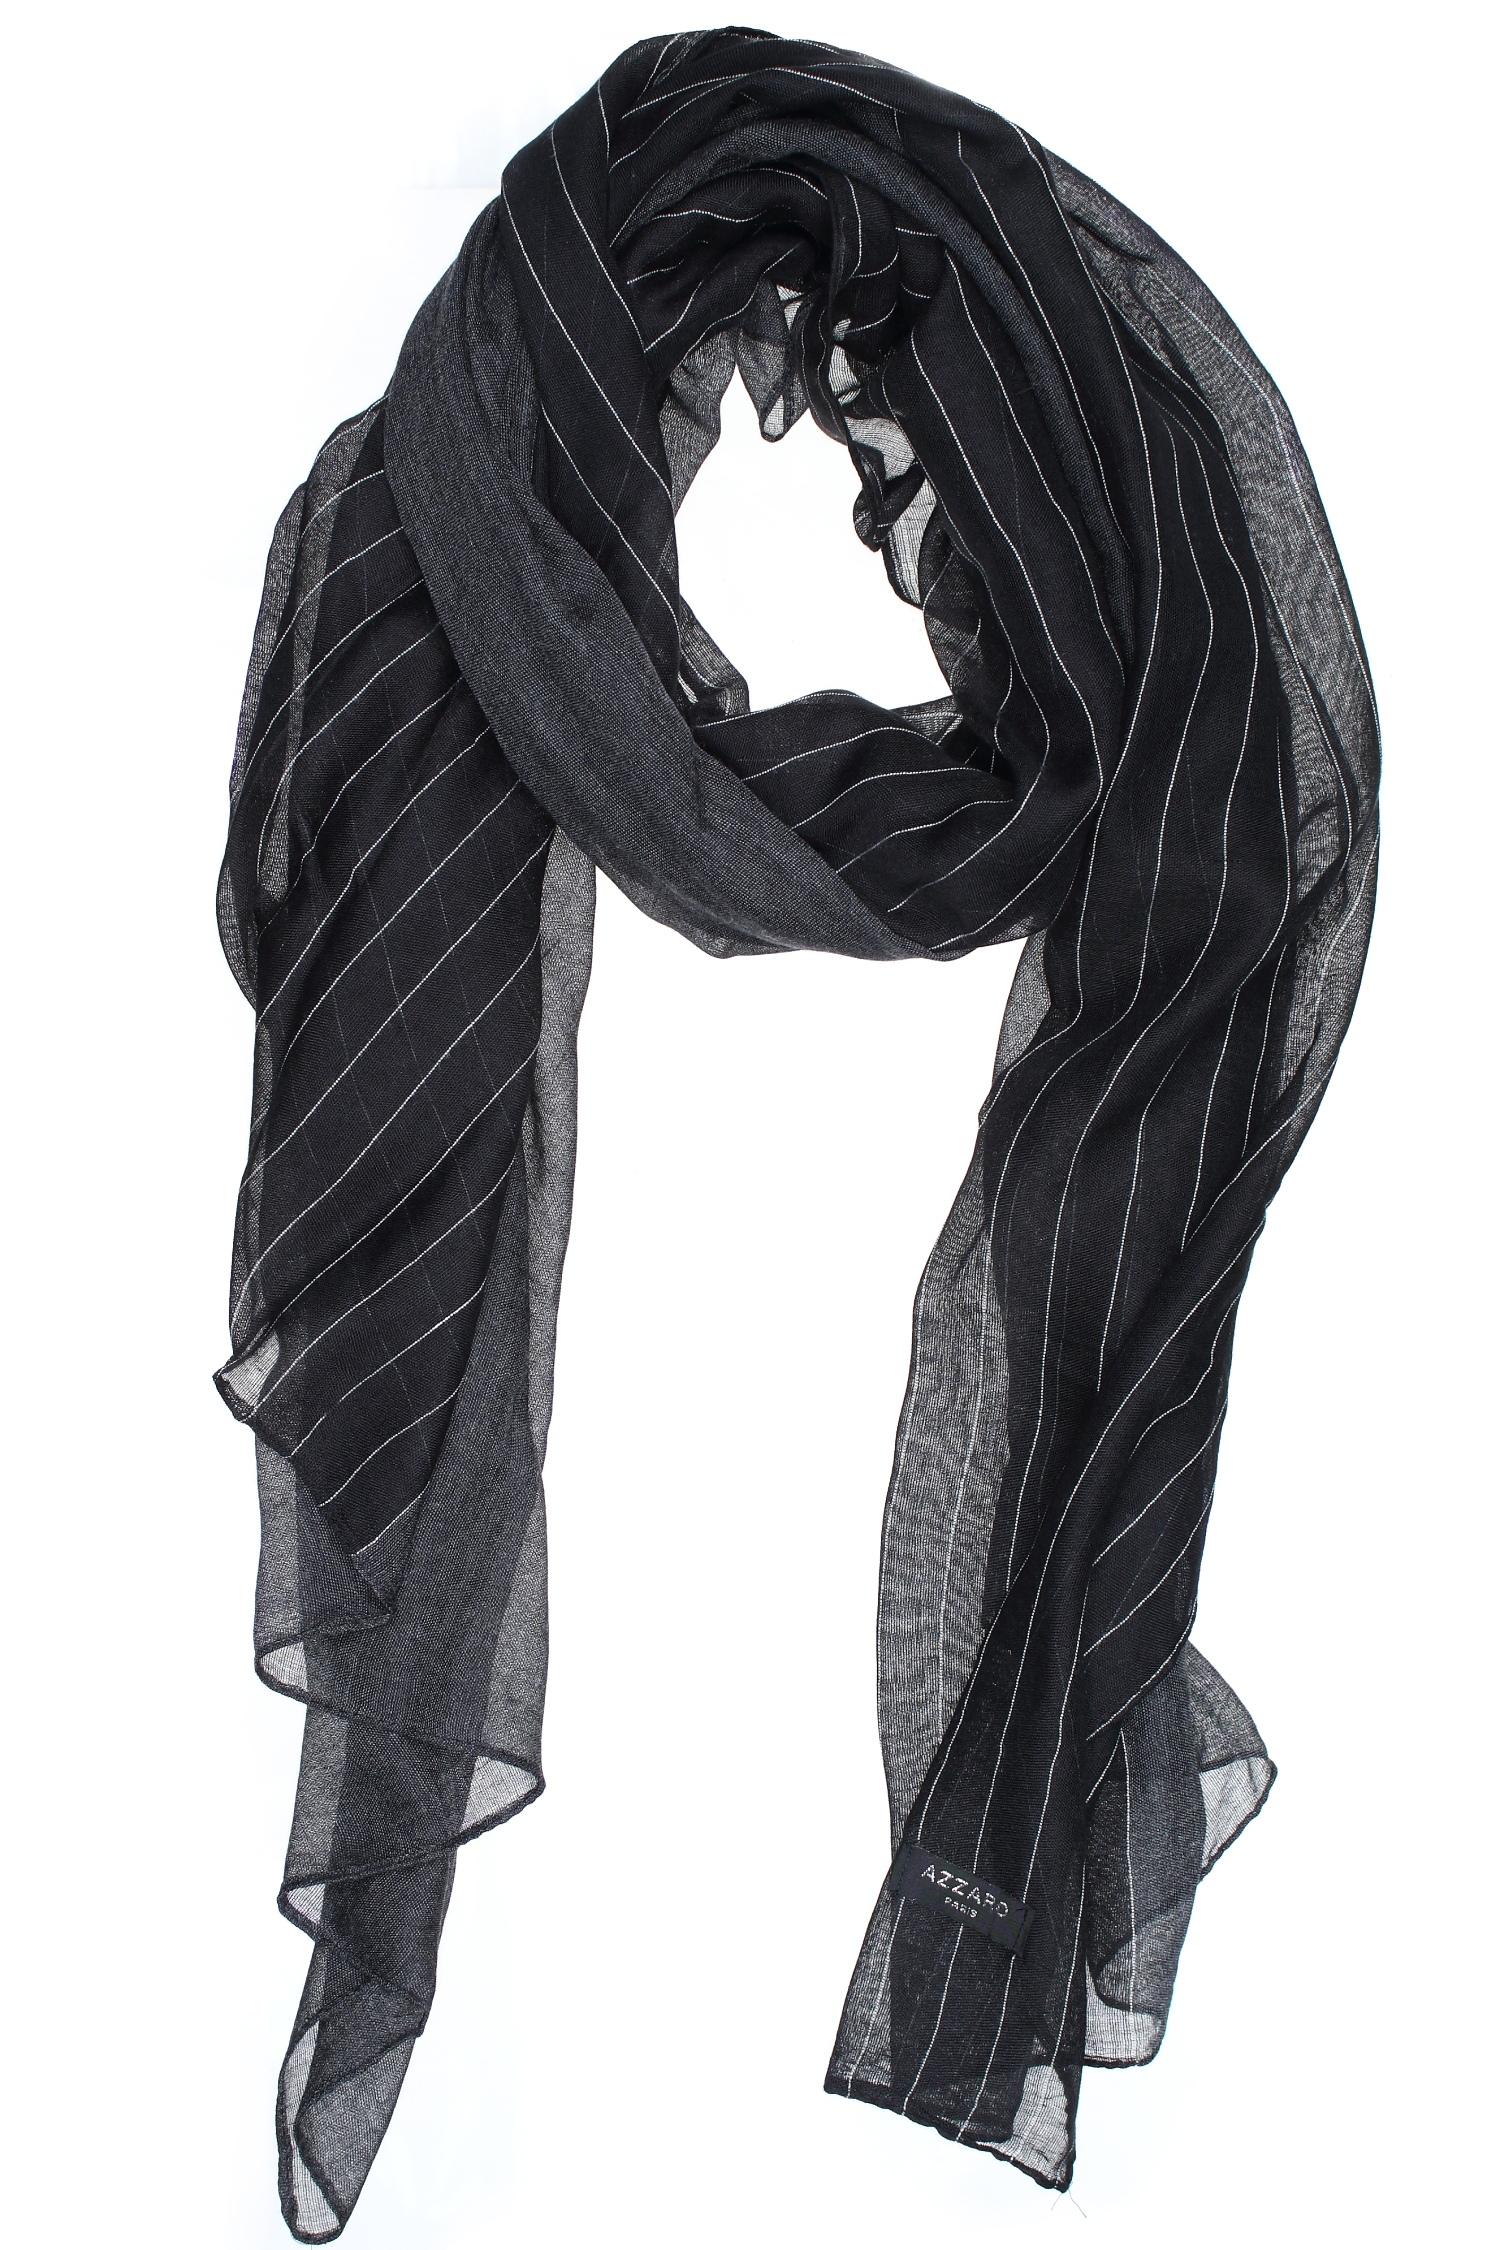 https://www.leadermode.com/184144/azzaro-foulard-motif-1-noir.jpg